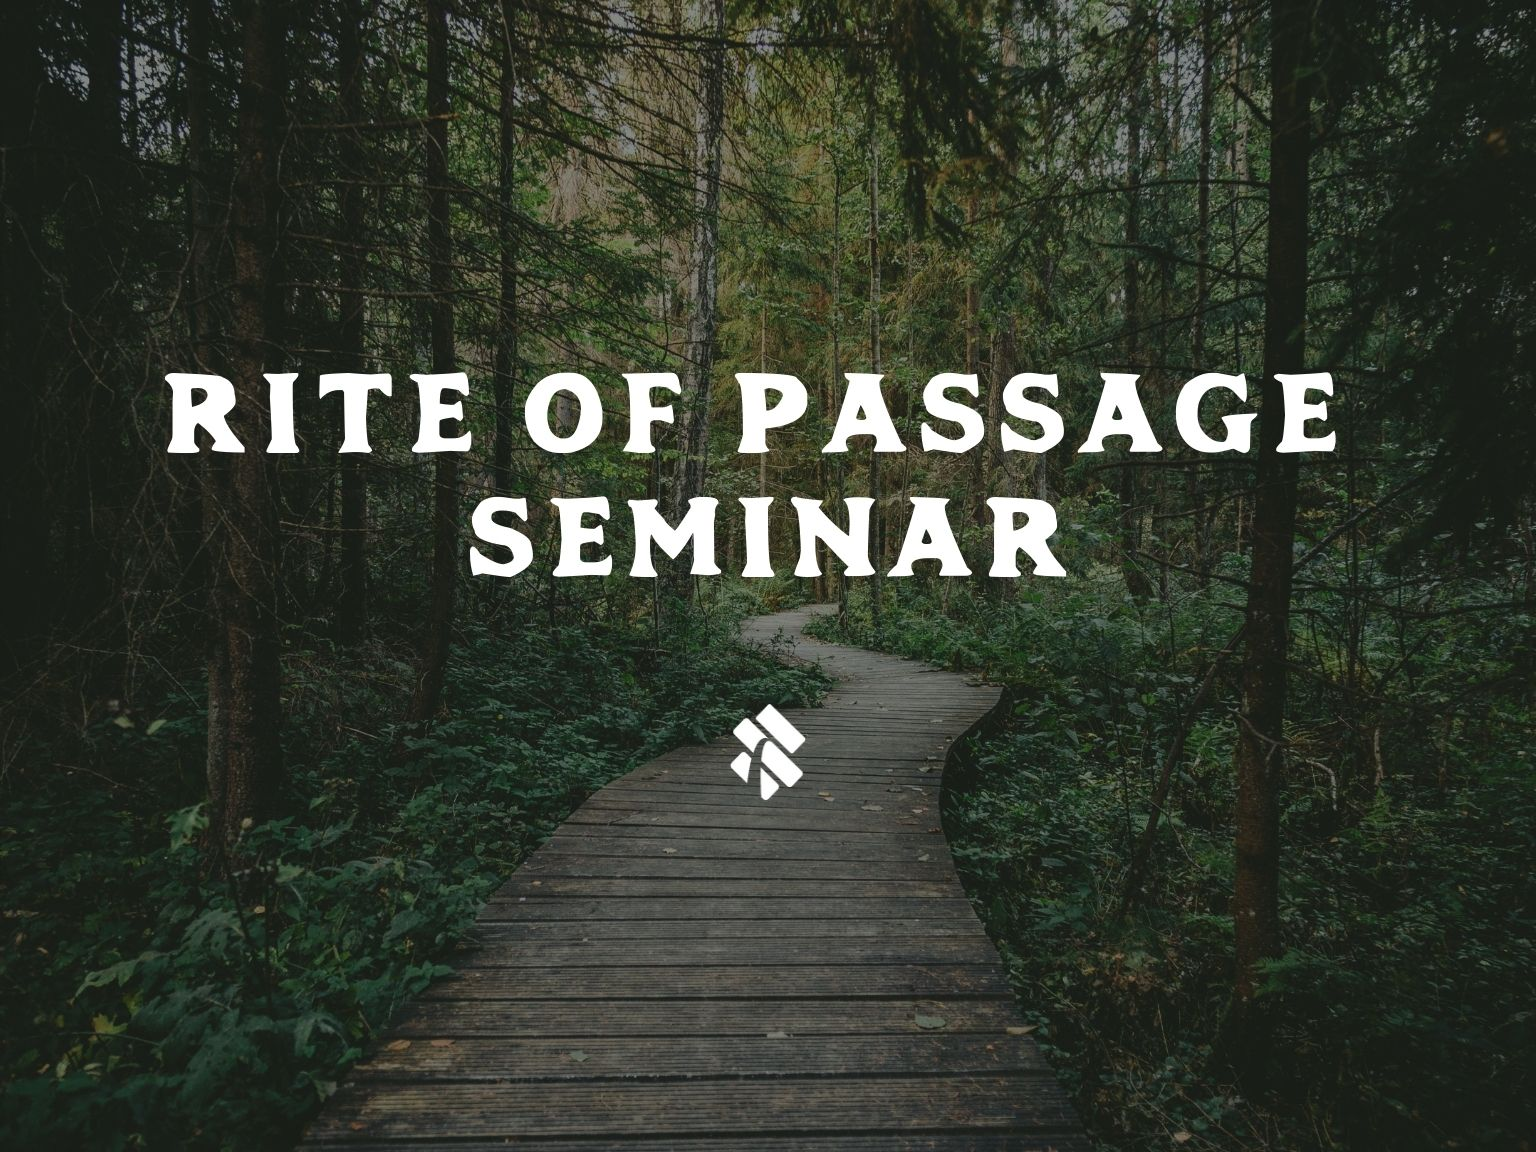 Rite of Passage Seminar 2020